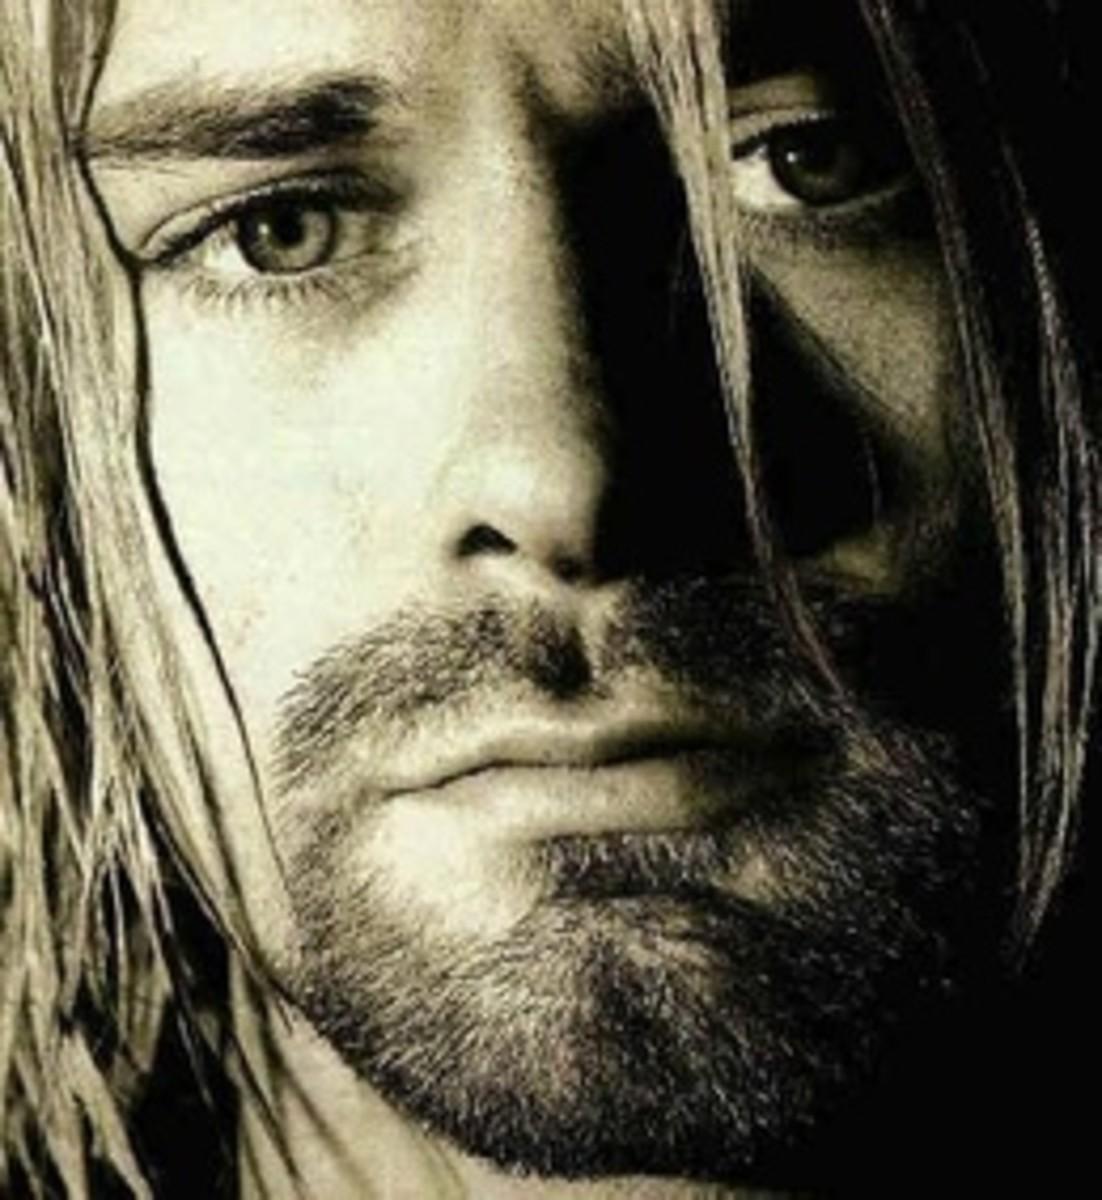 Kurt Donald Cobain, February 20th1967- April 4/5 1994